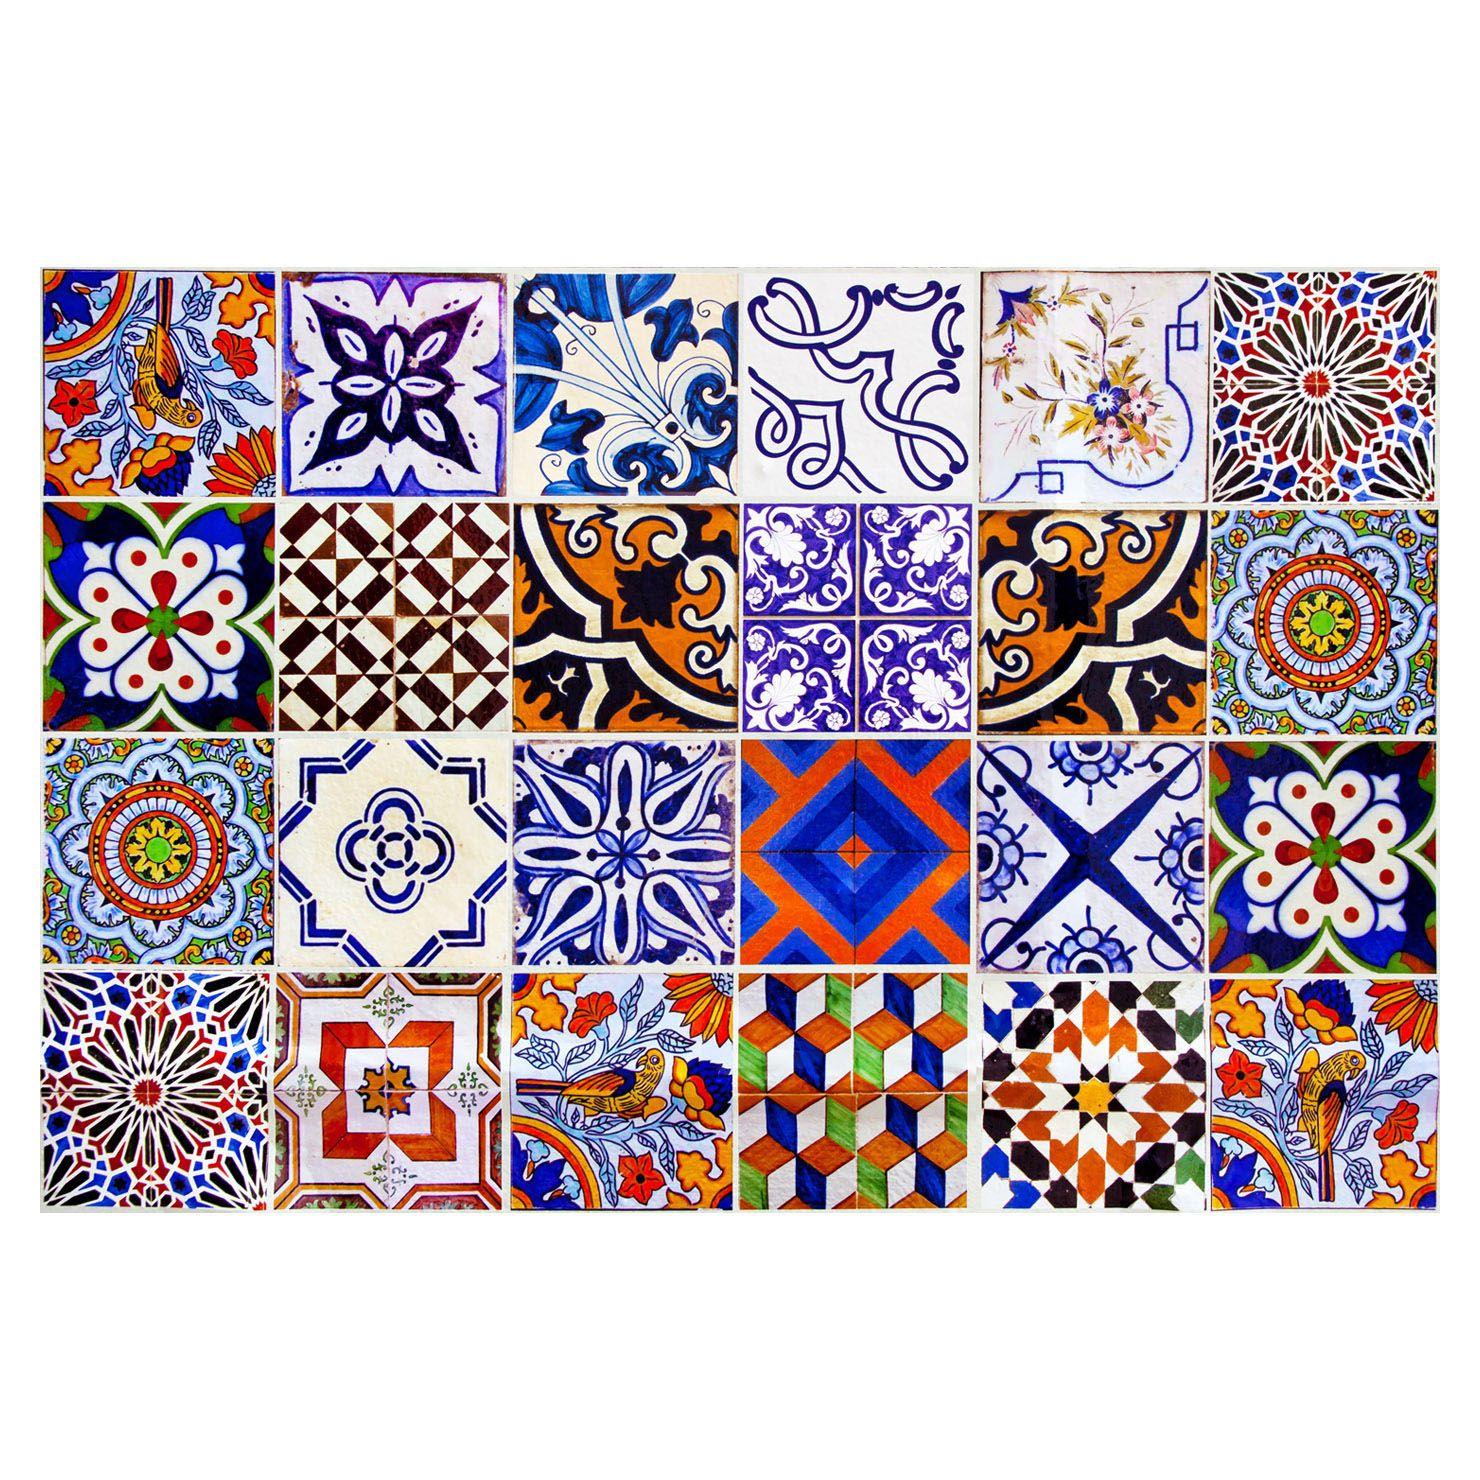 Floorart Tapis En Vinyle 50 X 140 Cm Collage Achica Bathroom Tile Stickers Tile Decals Traditional Tile